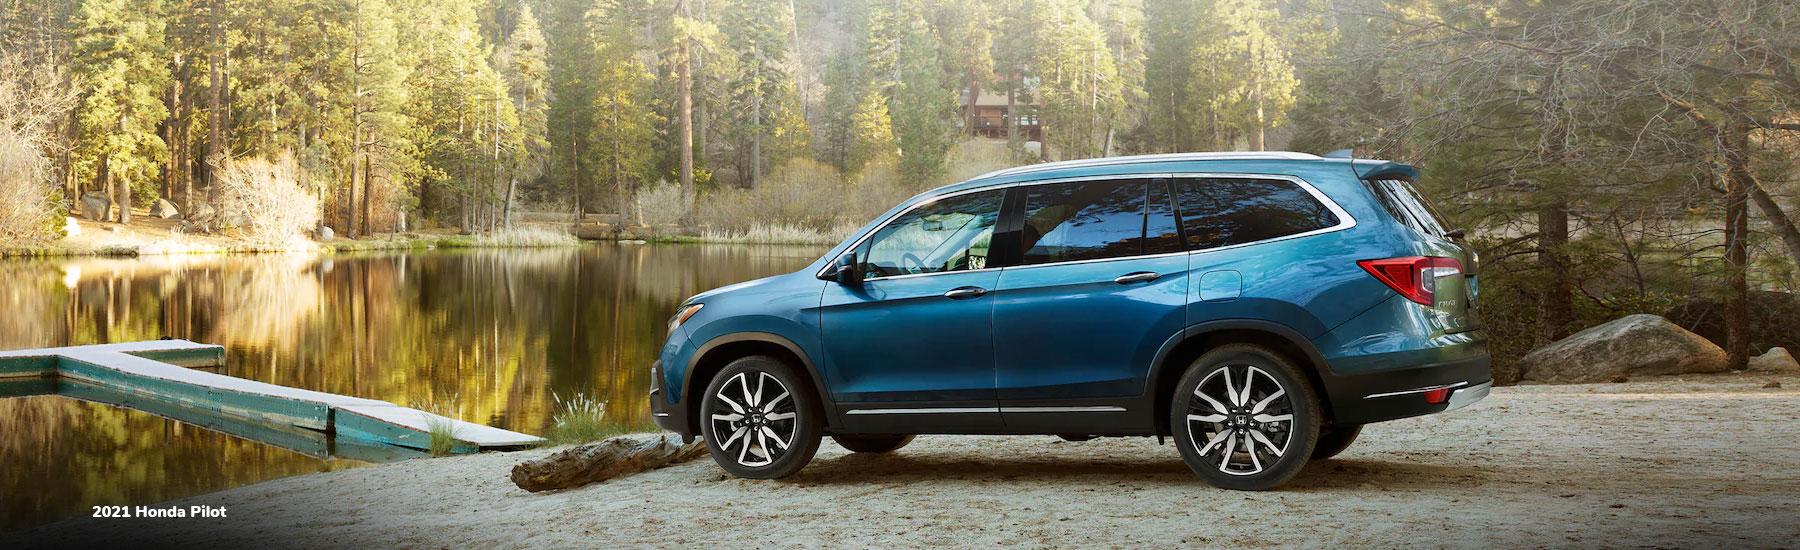 2021 Honda Pilot Mid-Size SUV For Sale In Bellevue, Washington